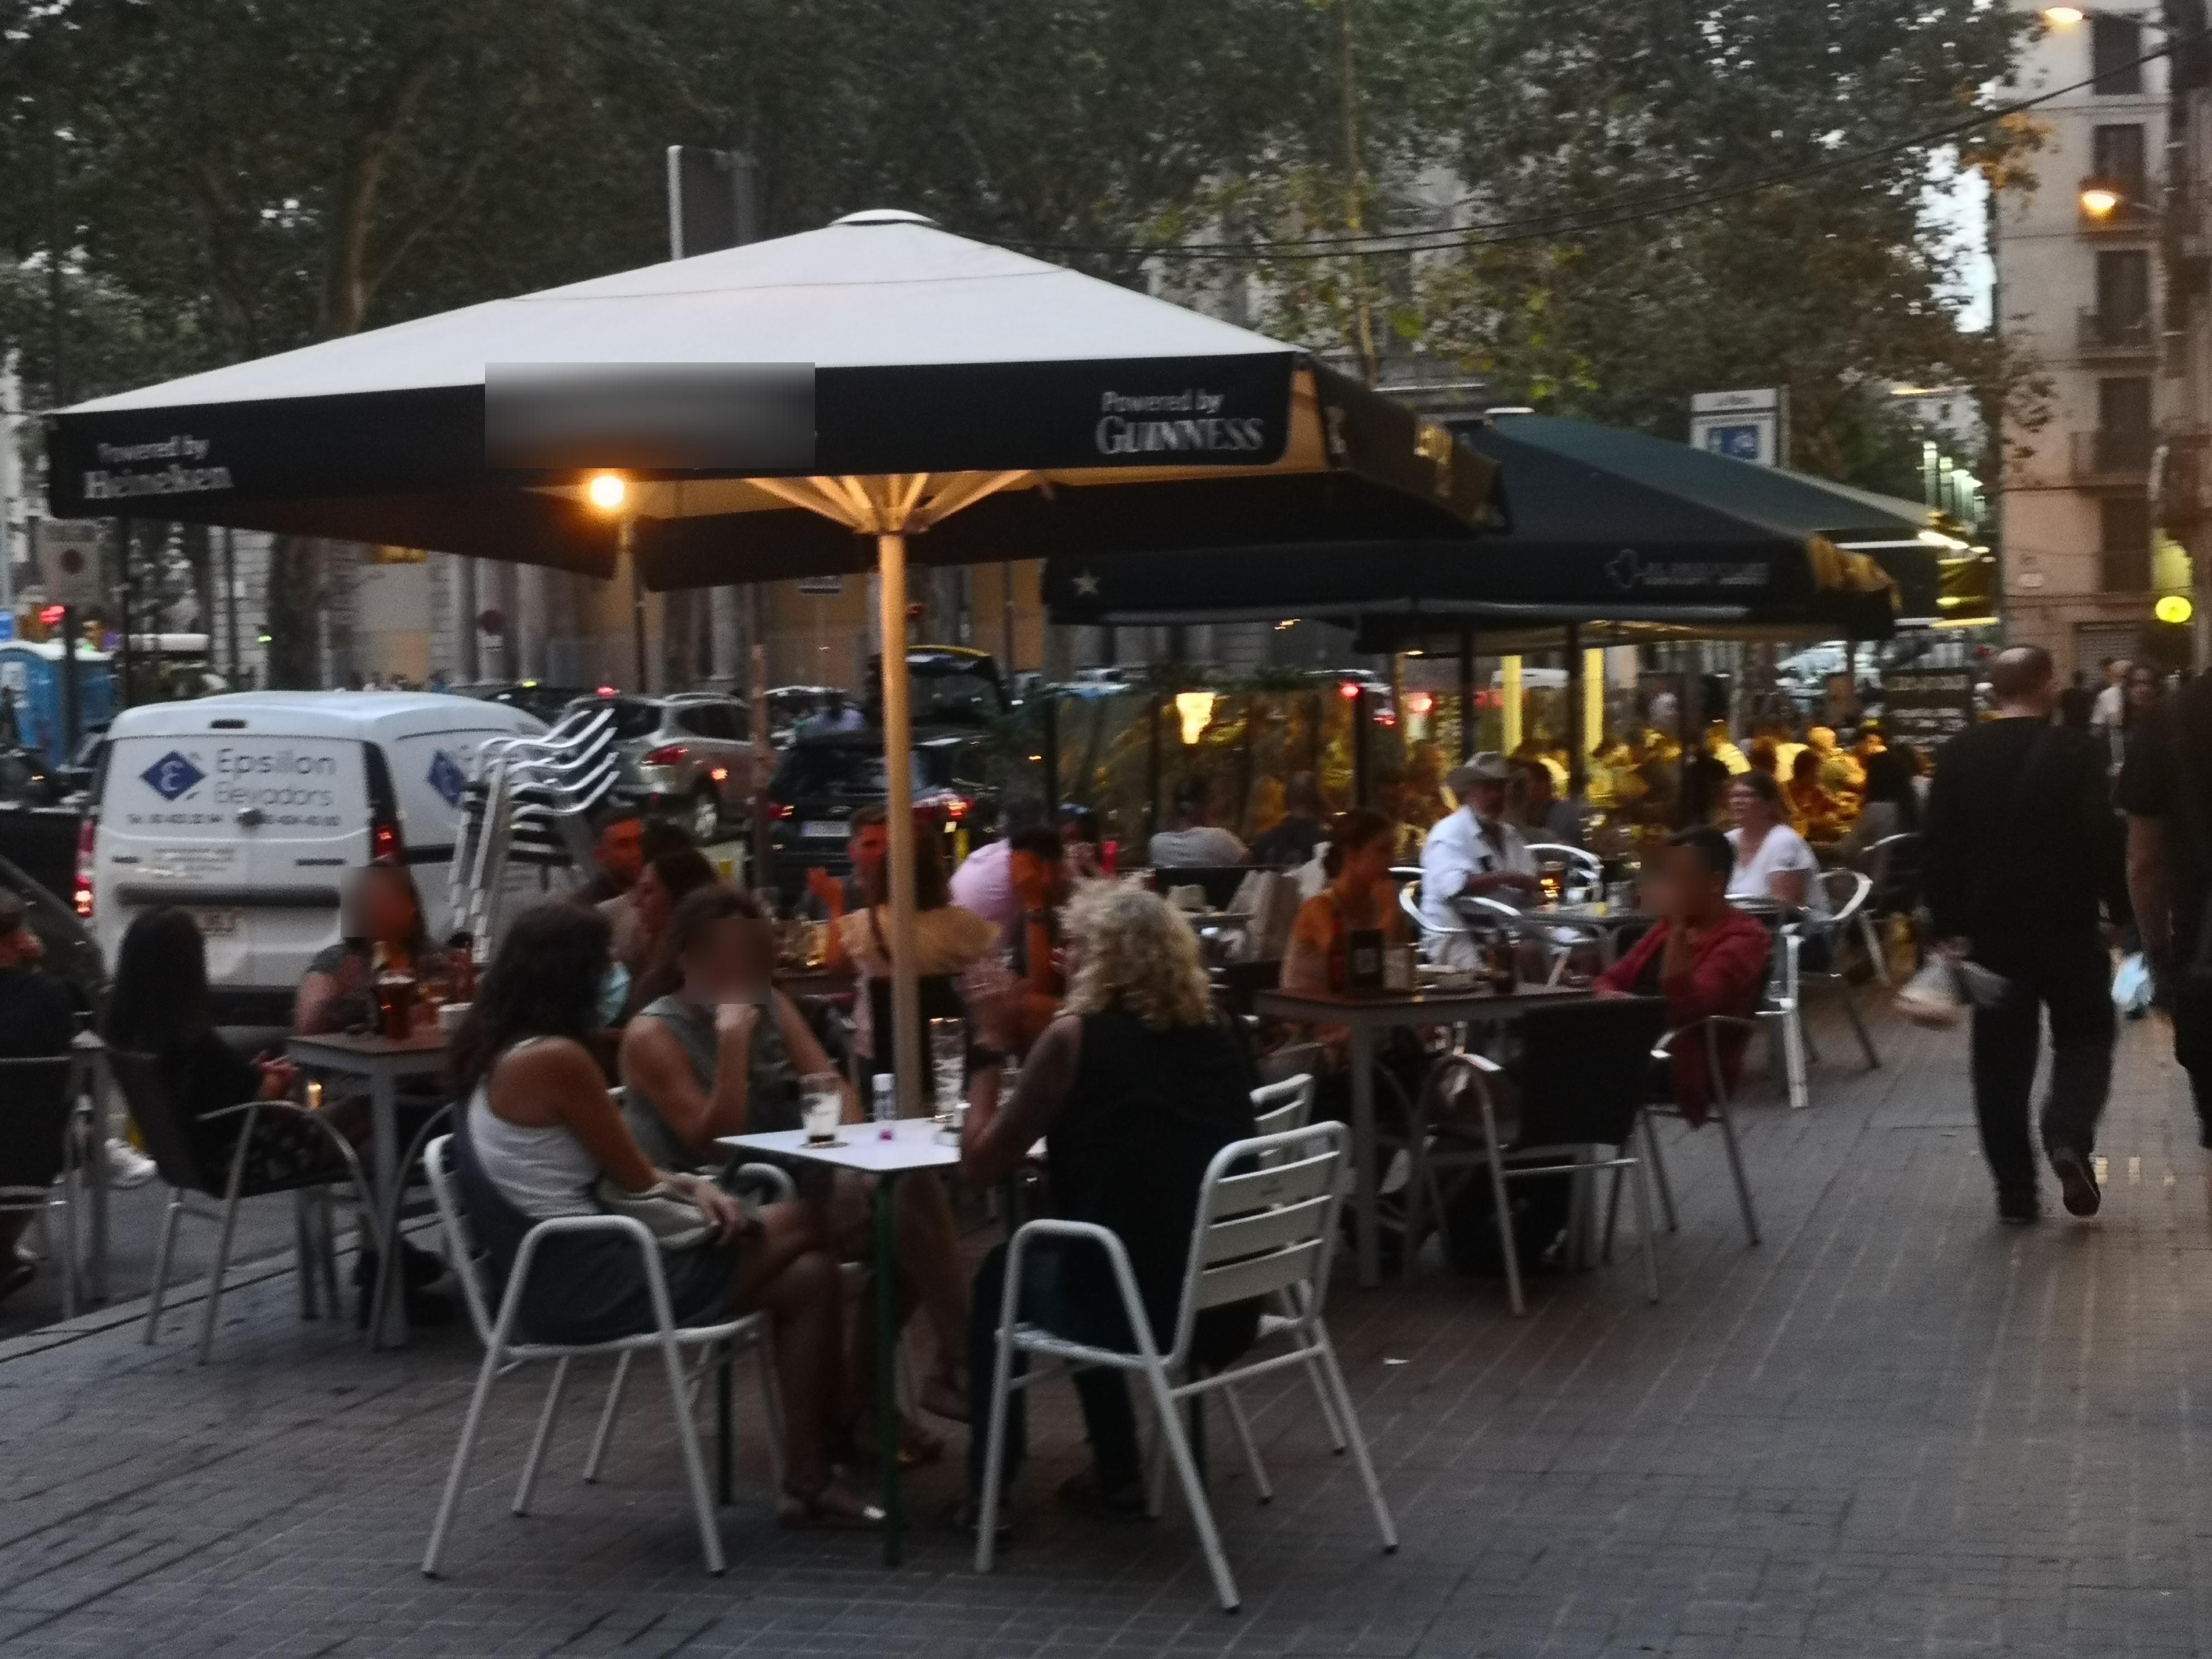 Pla de Palau, 9 - excés de taules, participant del Festival!!